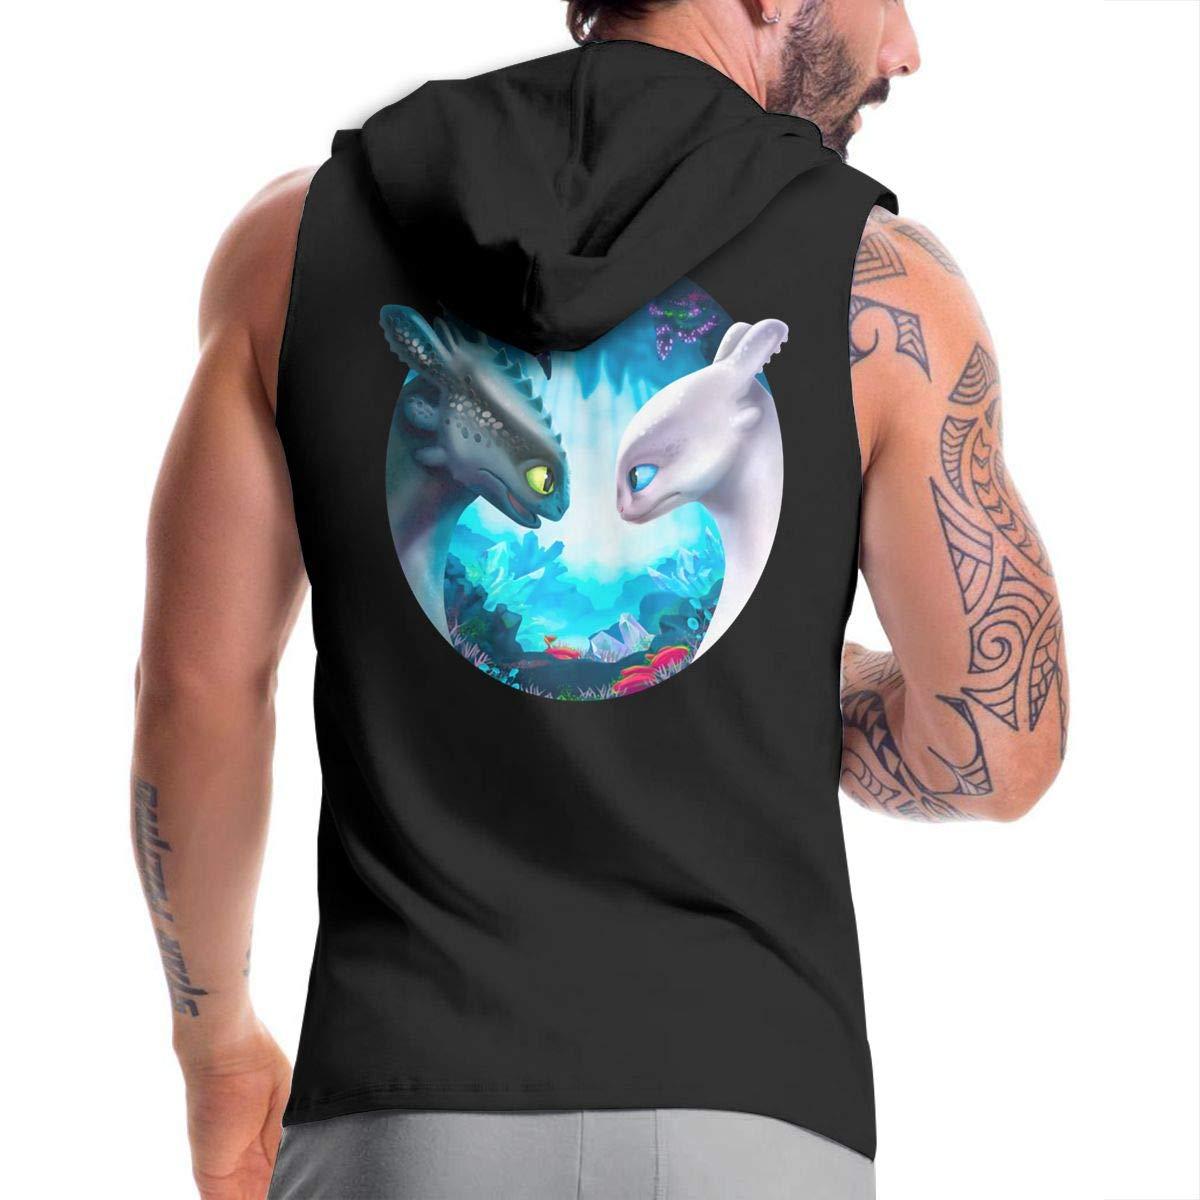 Kinggo Design Mans with Hood Bag How to Train Your Dragon The Hidden World Toothless and Light Fury Humor Zipper Sweatshirt